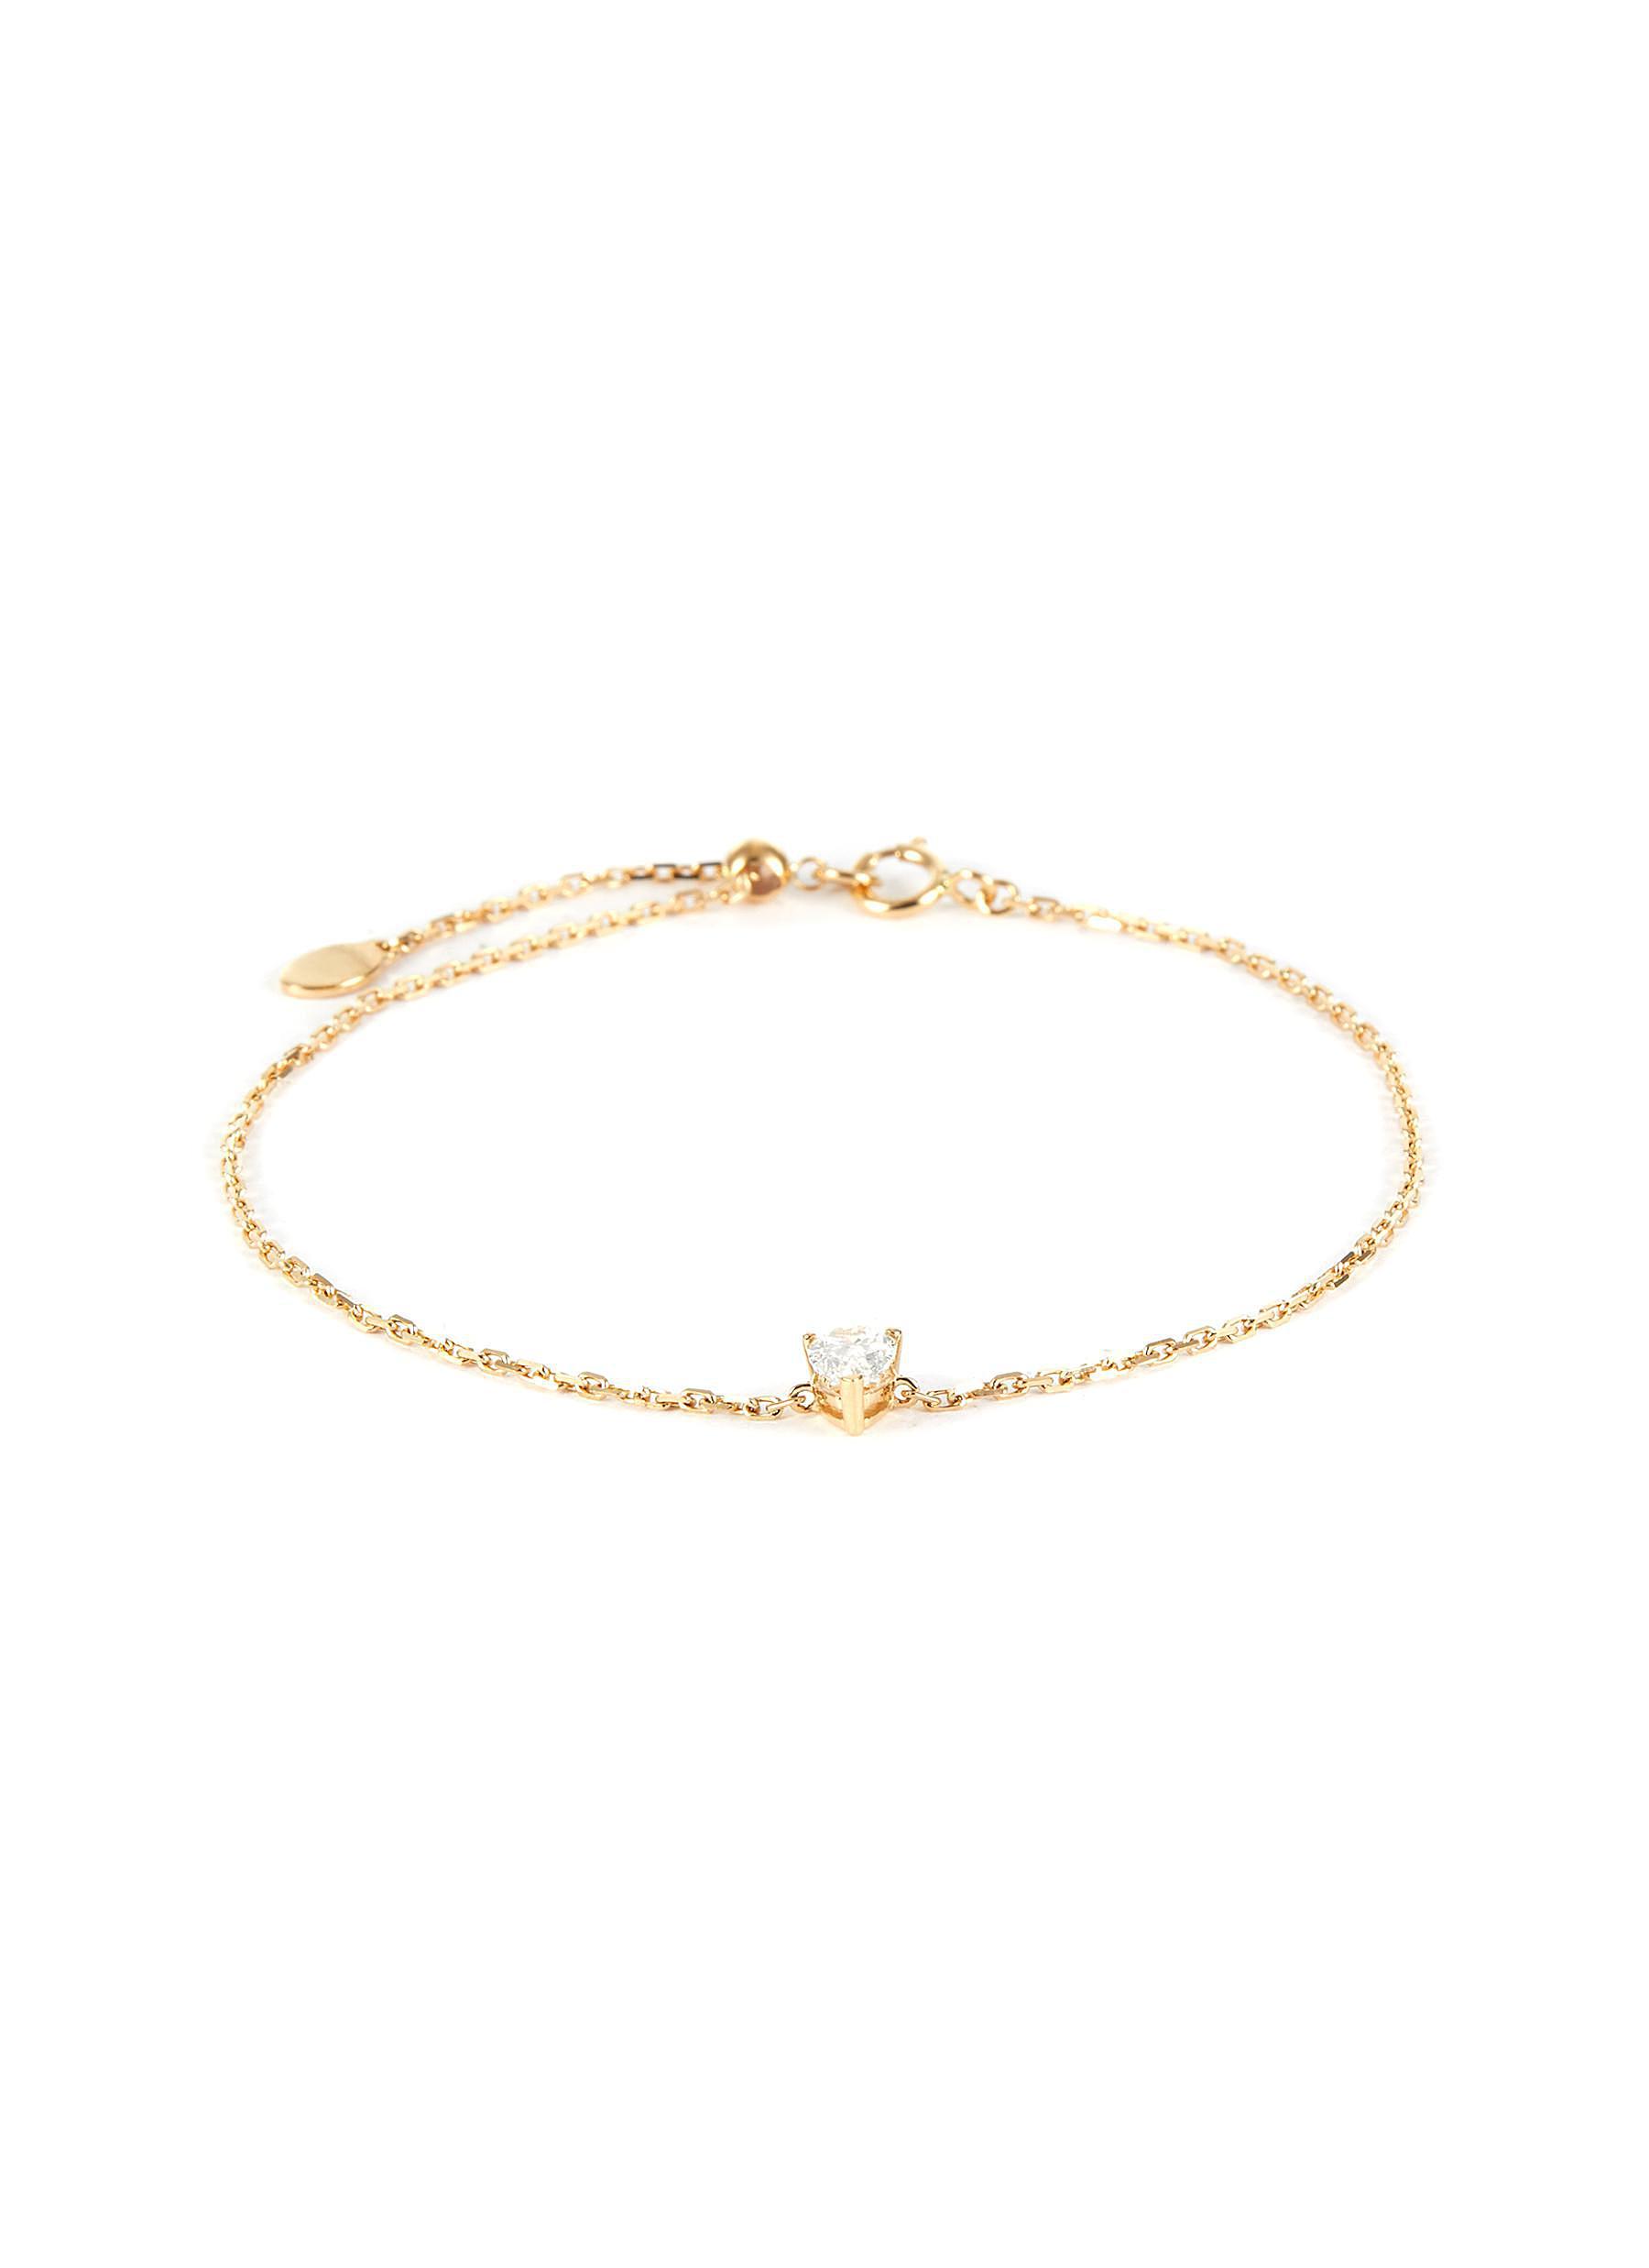 'Simone' lab grown diamond 18k gold charm bracelet